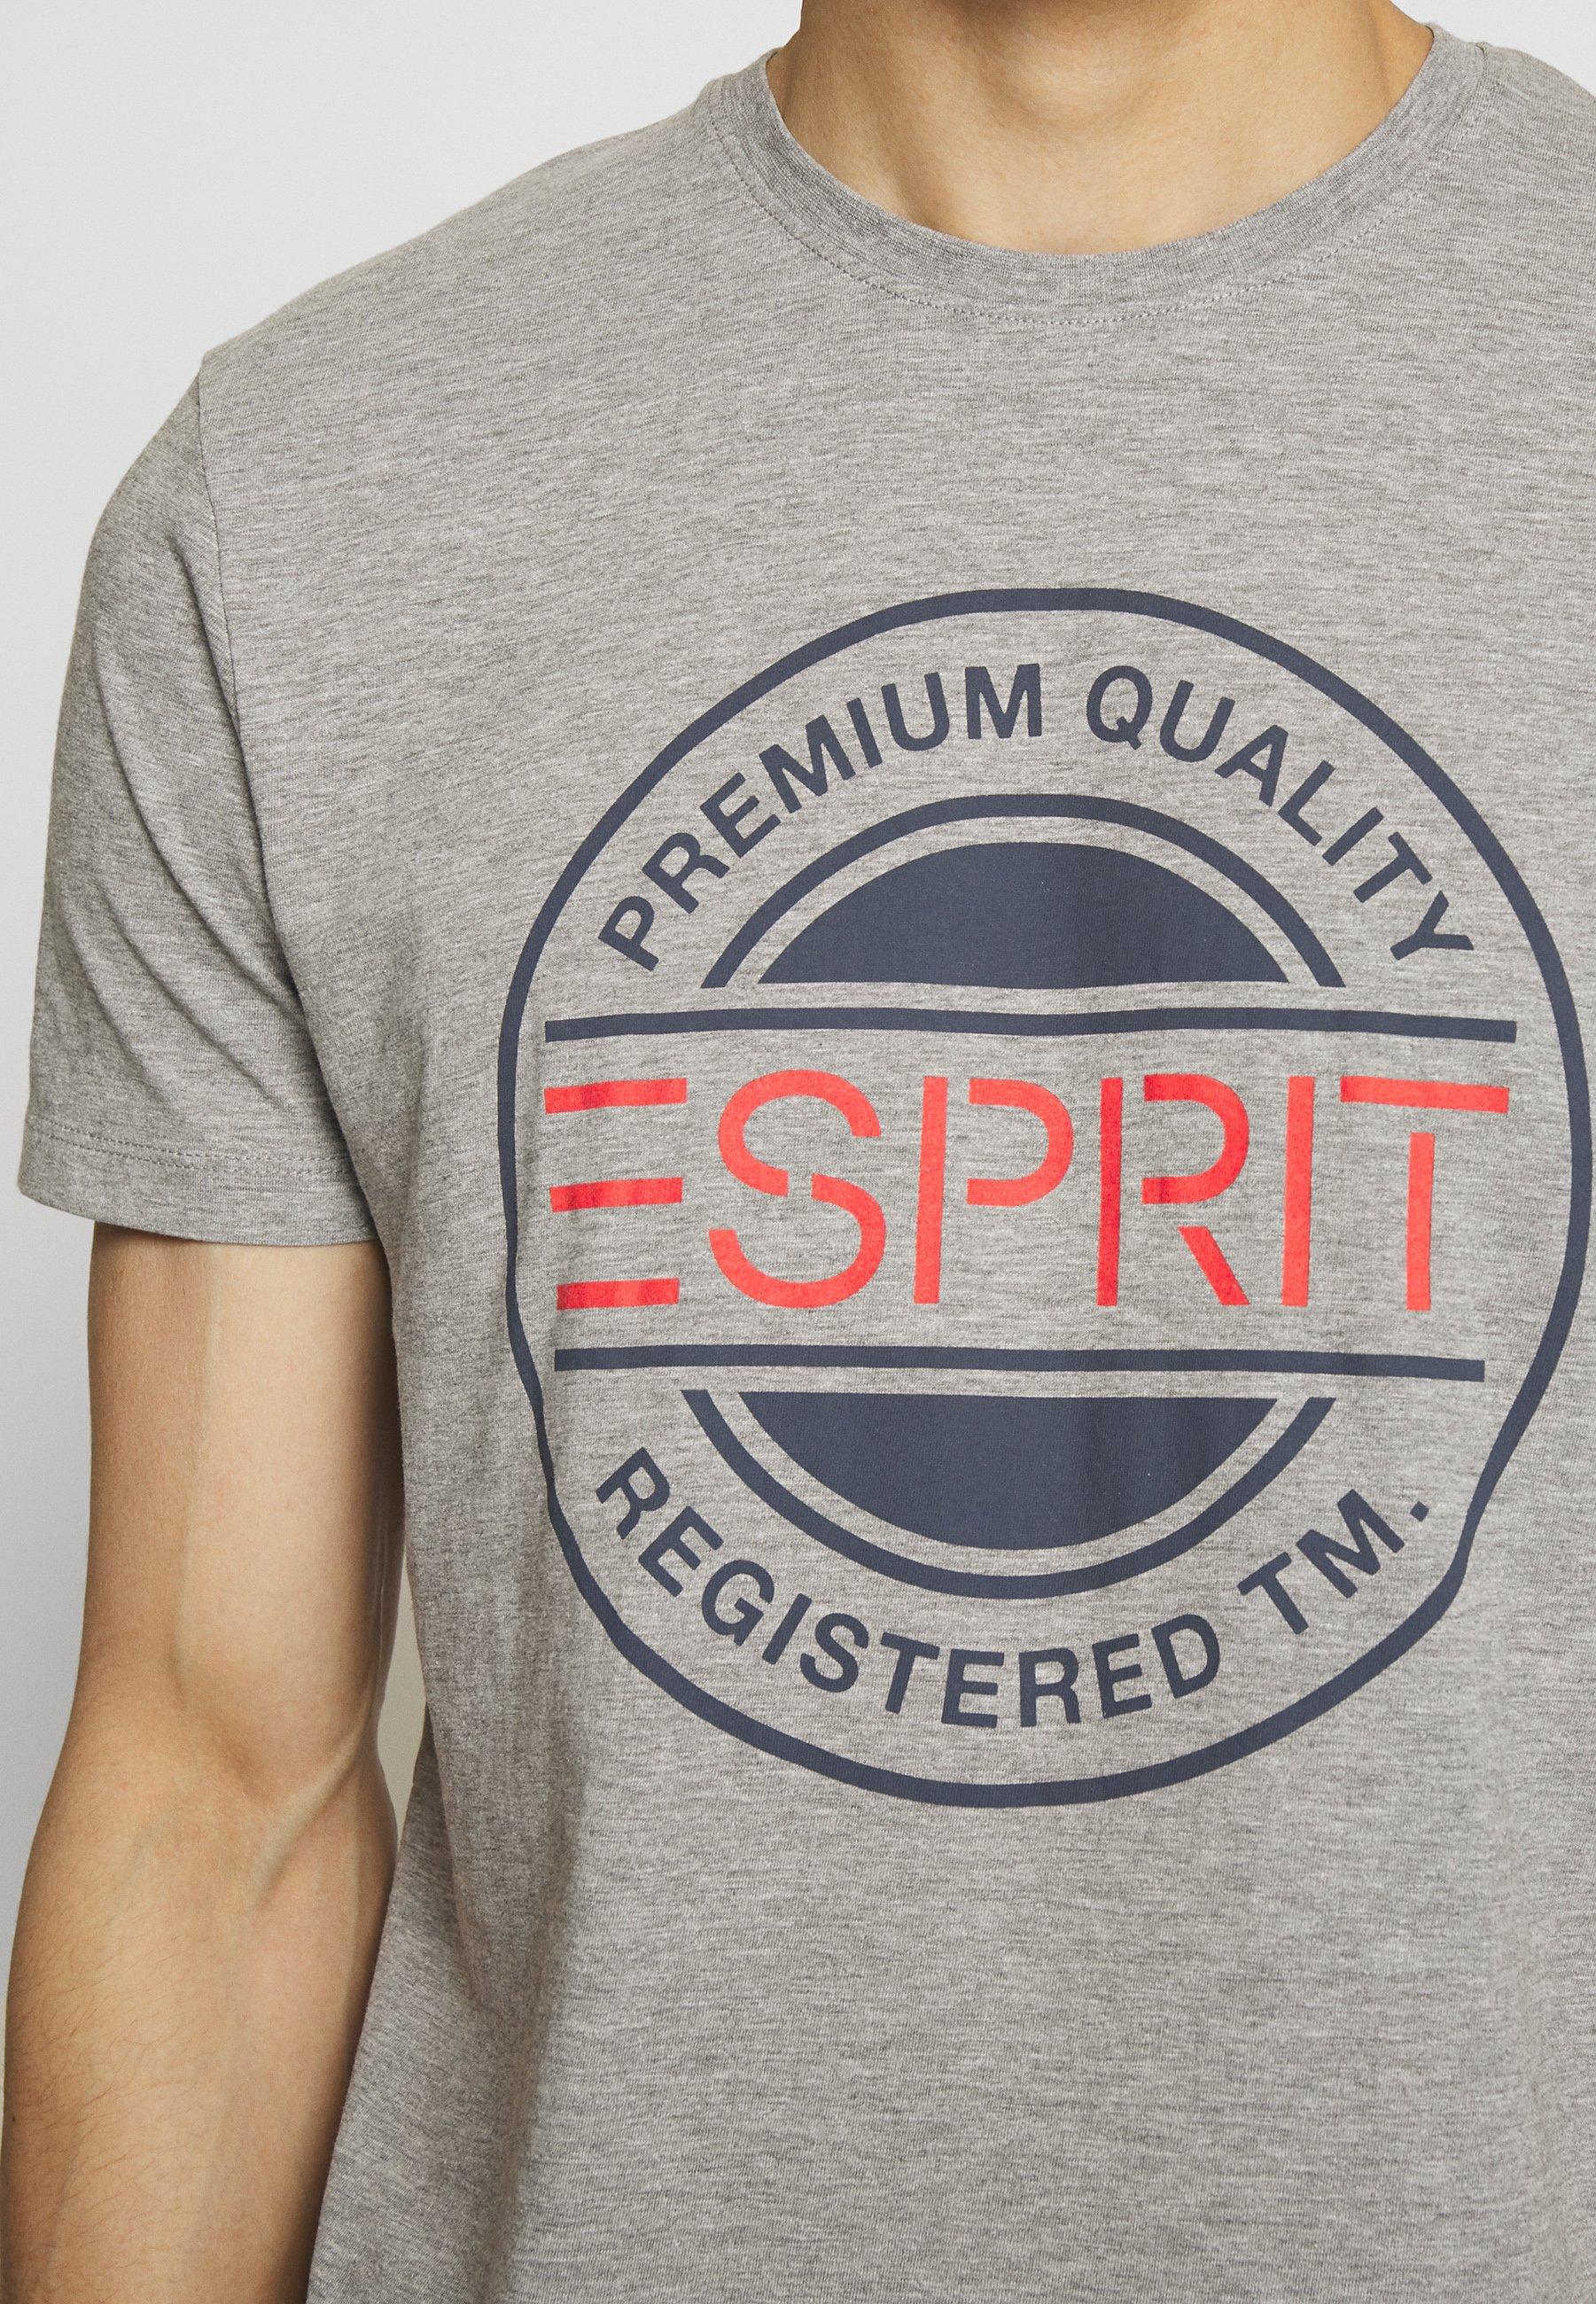 Esprit Print T-shirt - medium grey 0sAxN